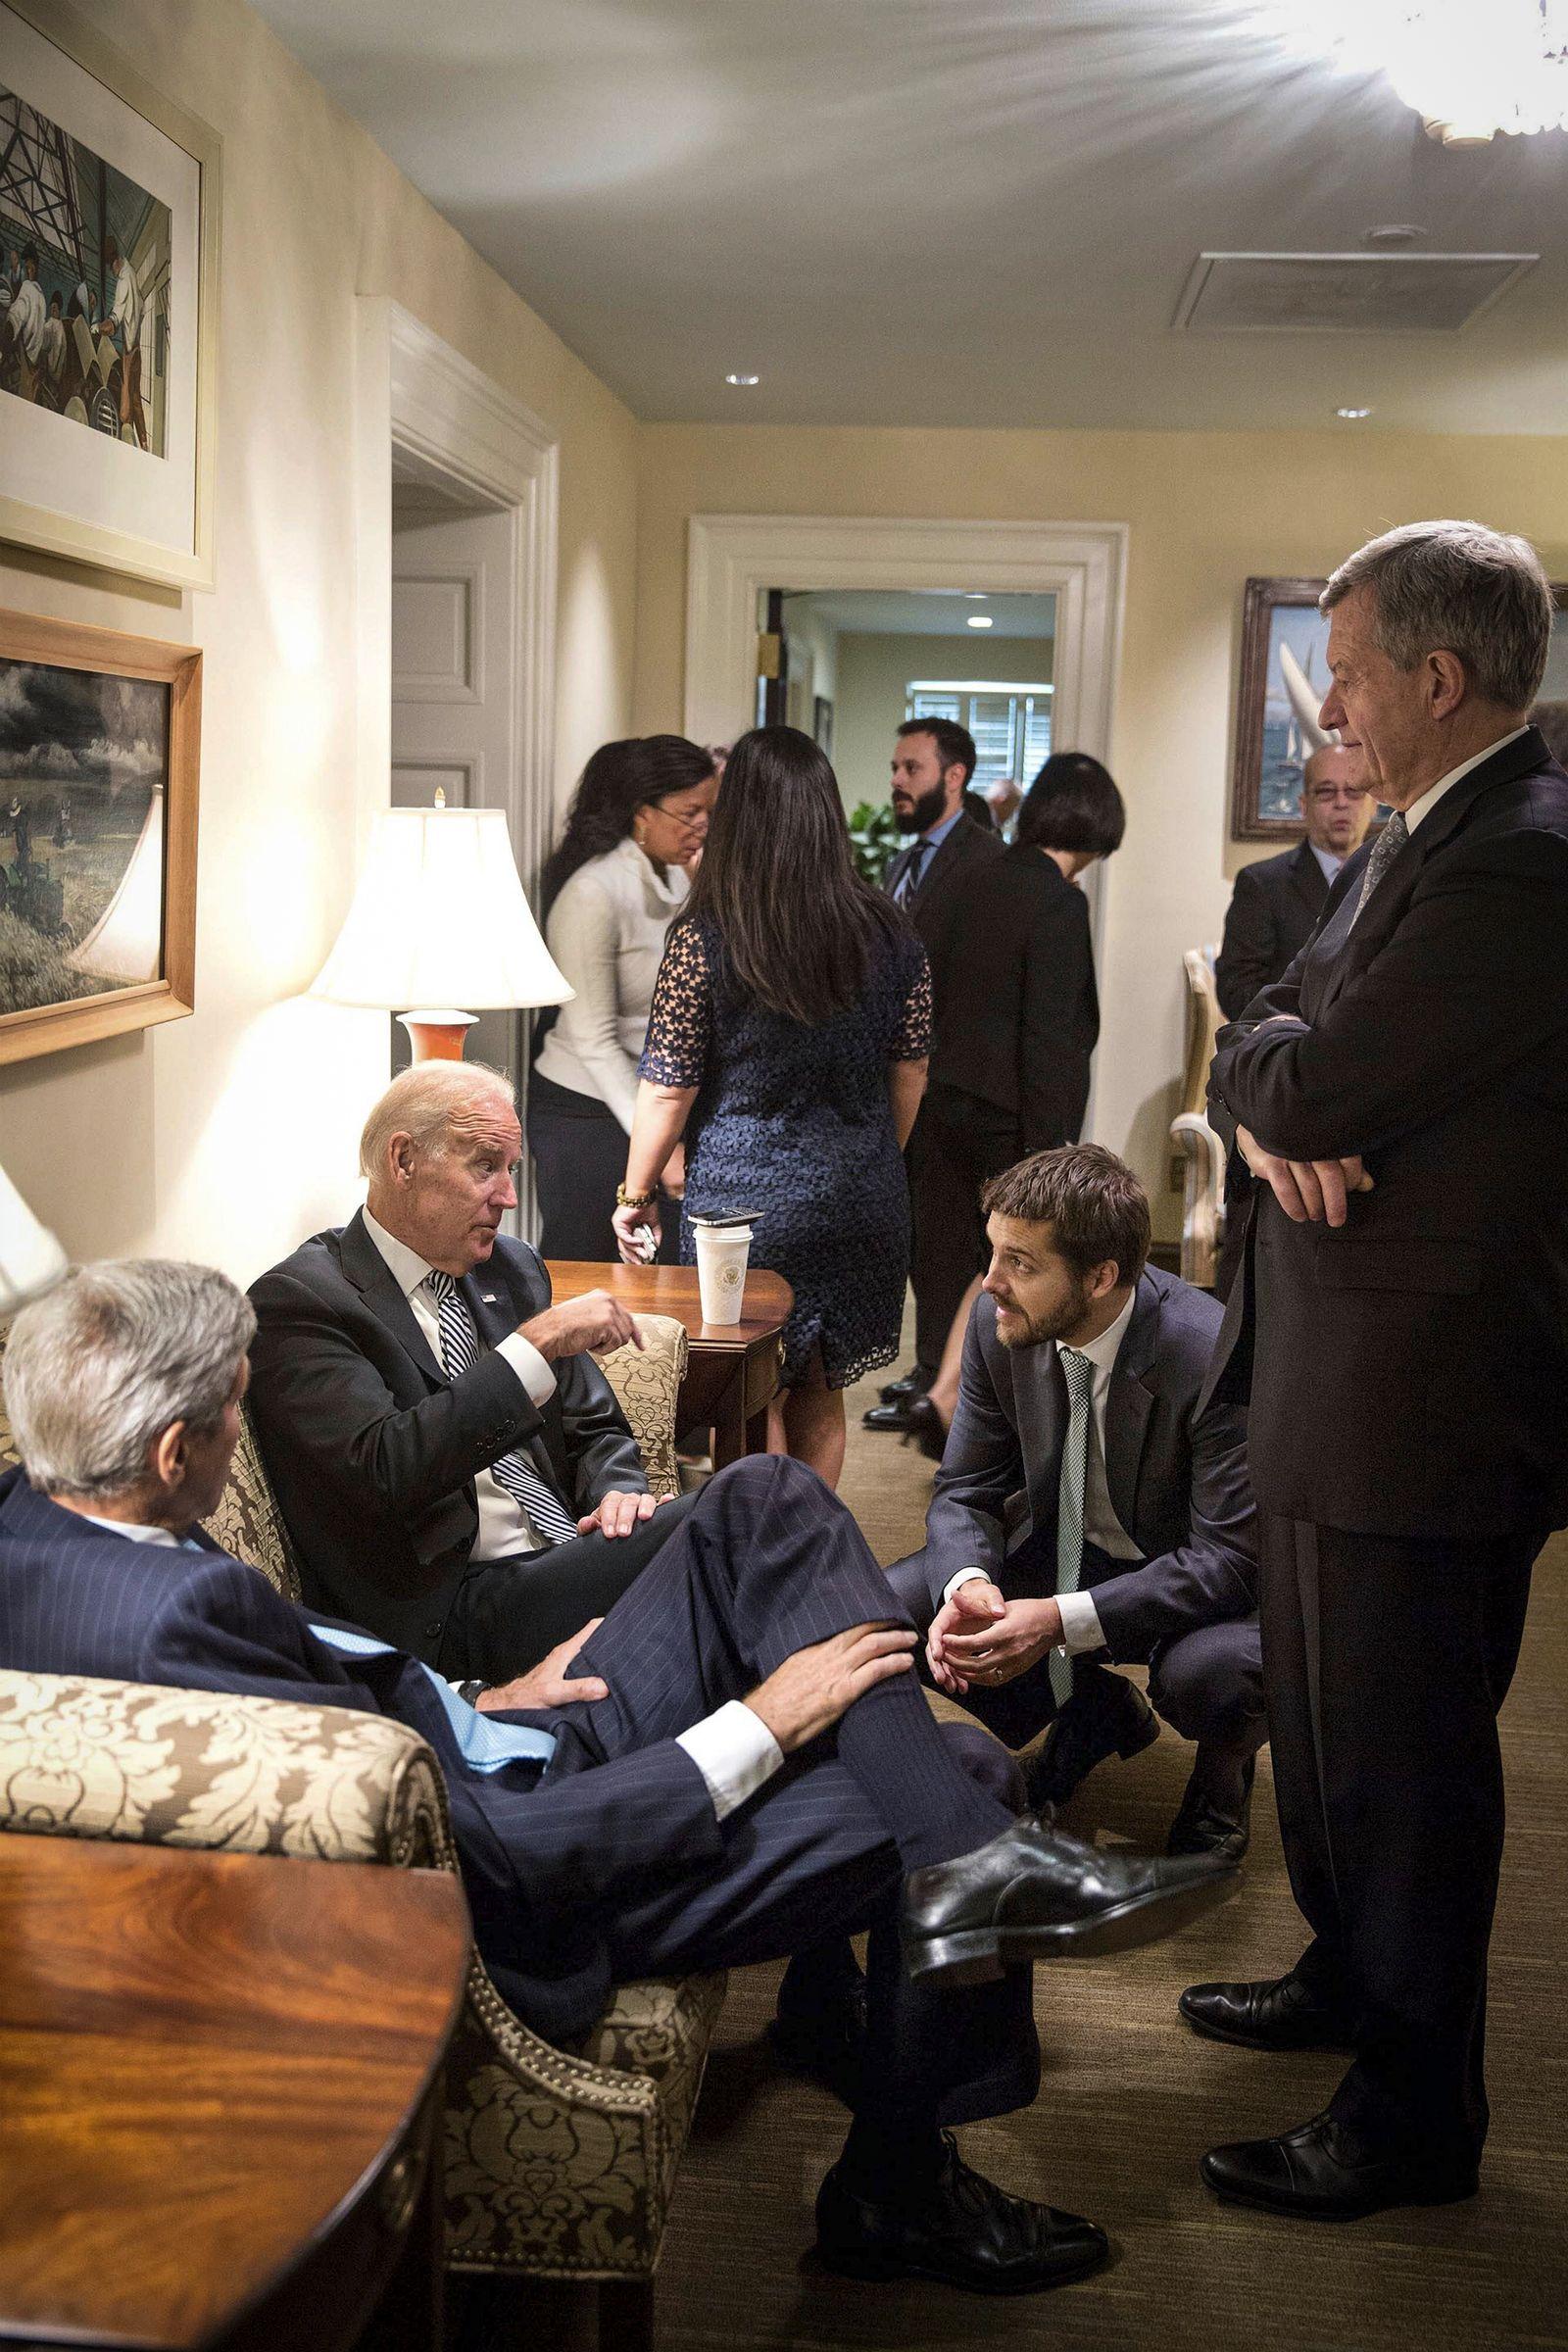 Sept. 25, 2015 - Washington, United States of America - U.S. Vice President Joe Biden talks with Sec